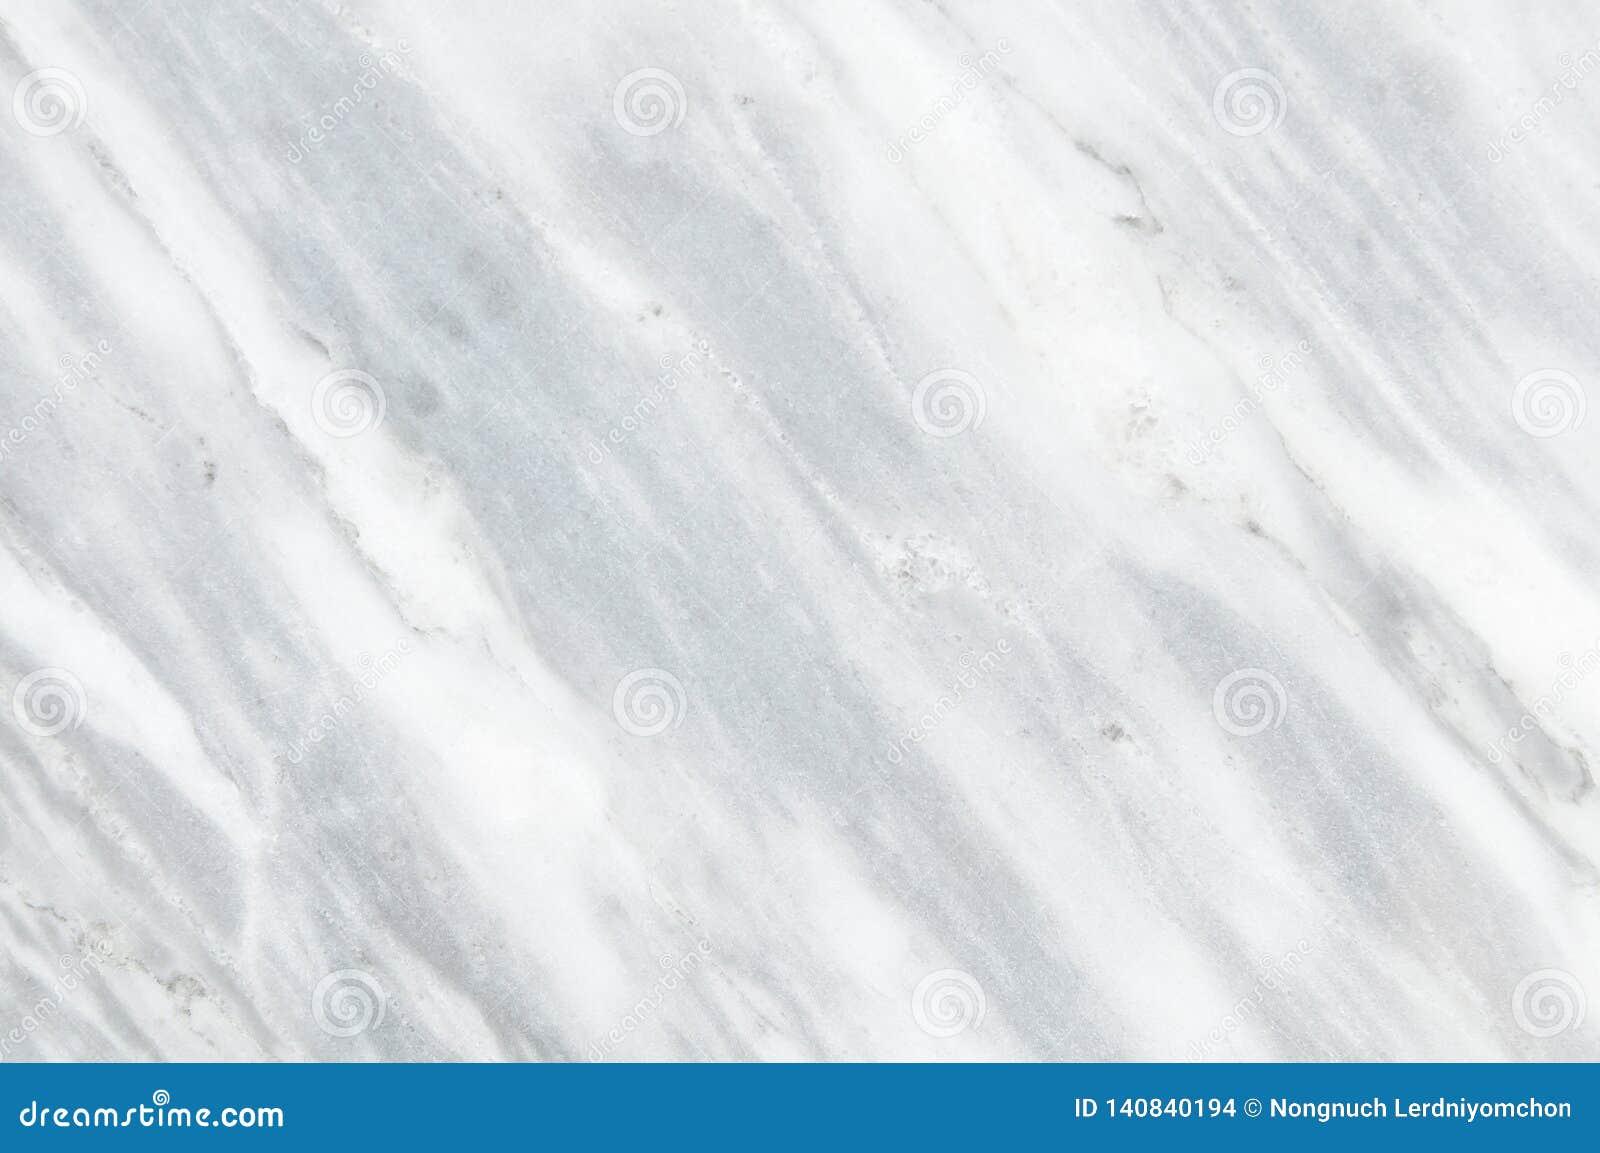 Белый или светлый - серая мраморная каменная предпосылка Белый мрамор, фон текстуры кварца Светлая картина стены и мрамора панели